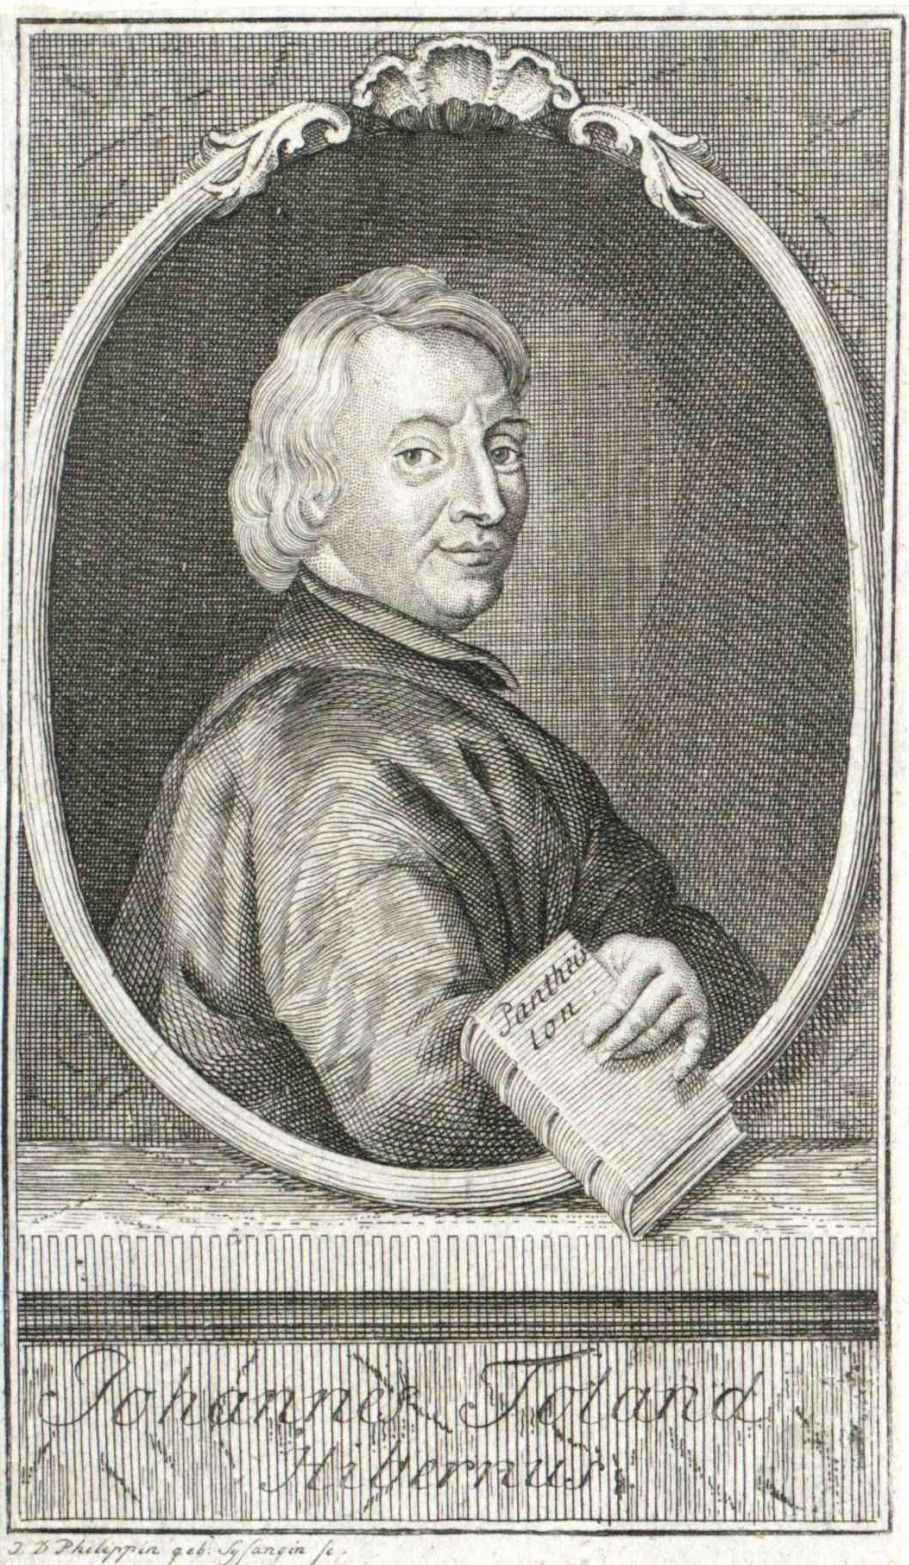 John Toland (November 30, 1670 - March 11, 1722), Irish philosopher.